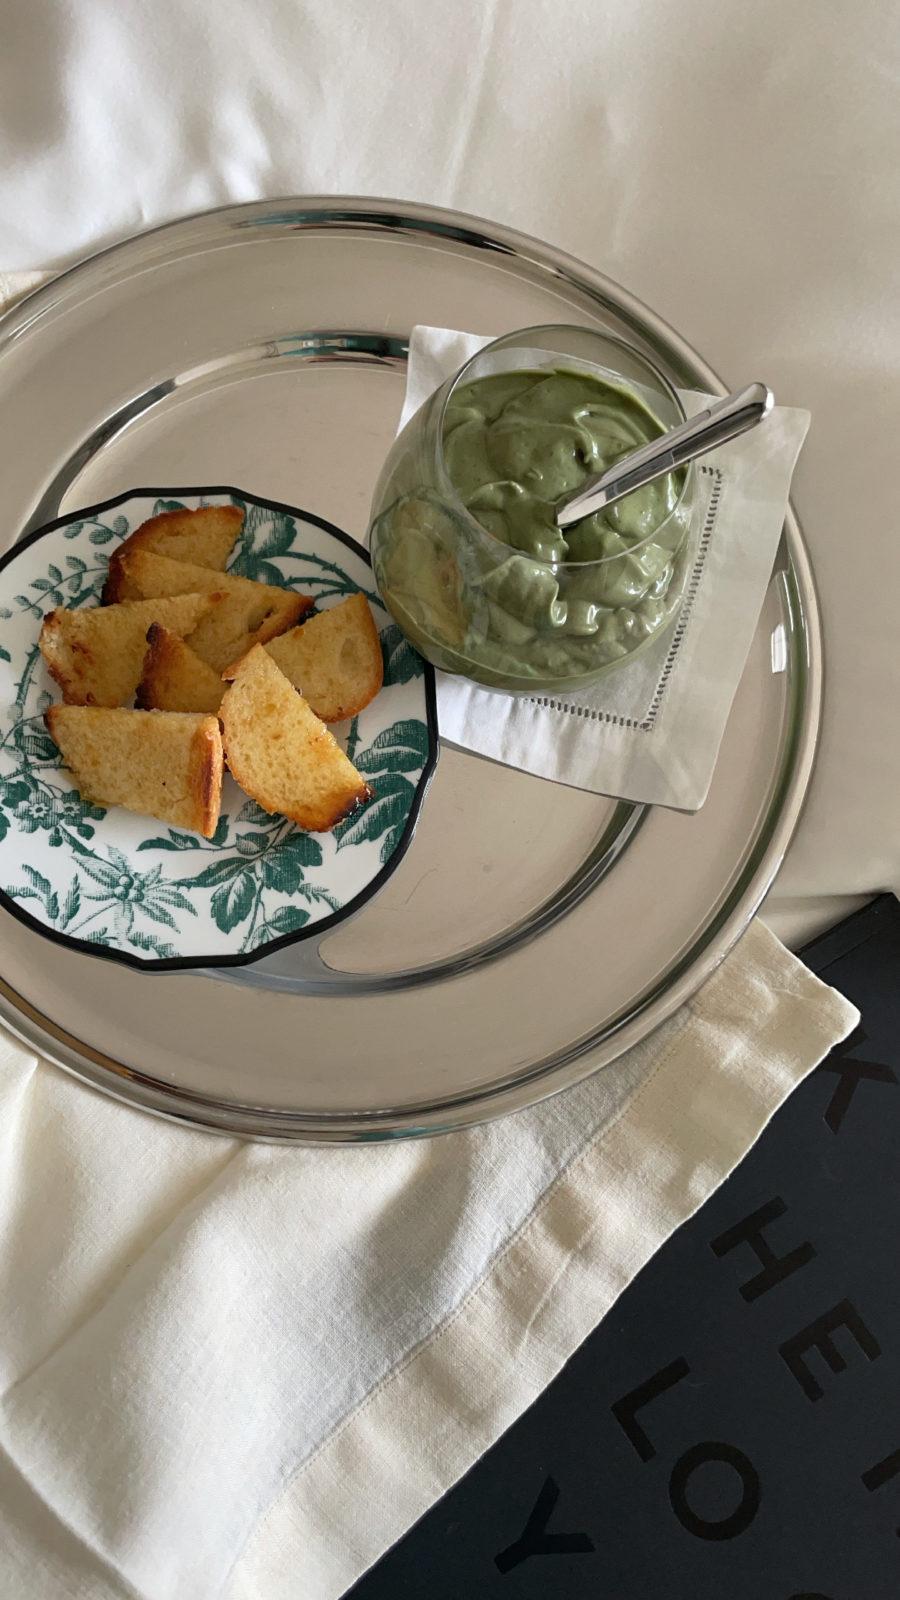 kourtney kardashian avocado shake and bread on tray